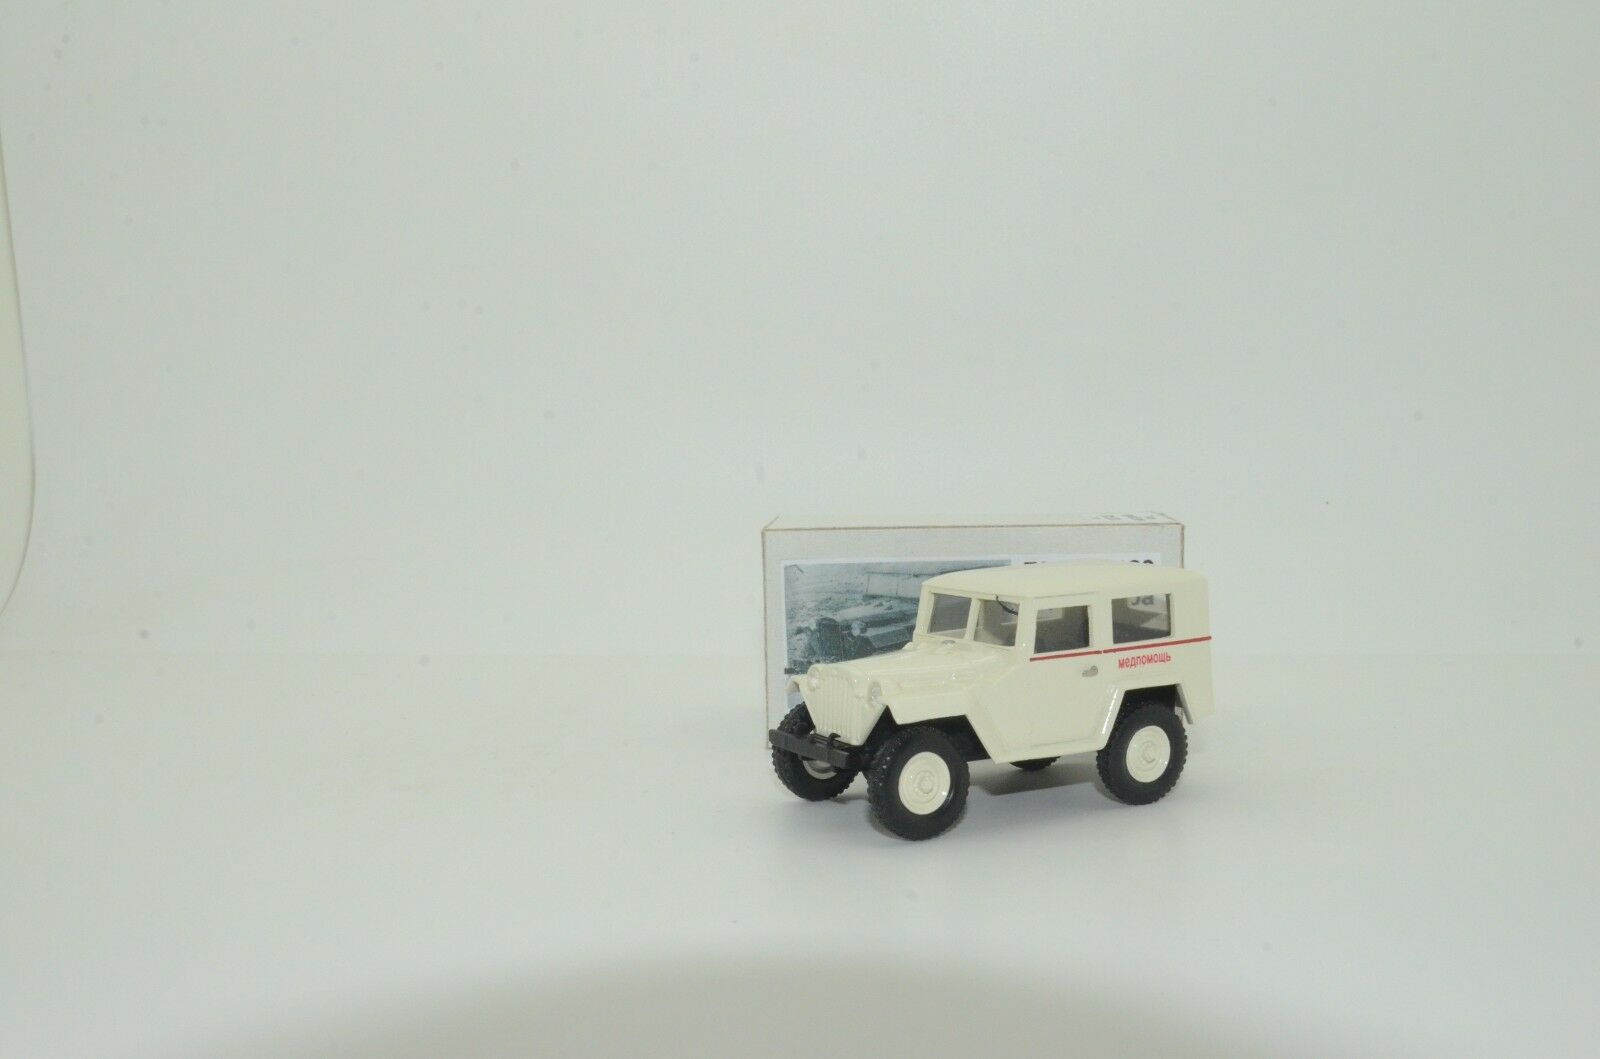 rara Gaz 67-420 Jeep ambulancia médica coche hecho a mano Vector Modelos 1/43